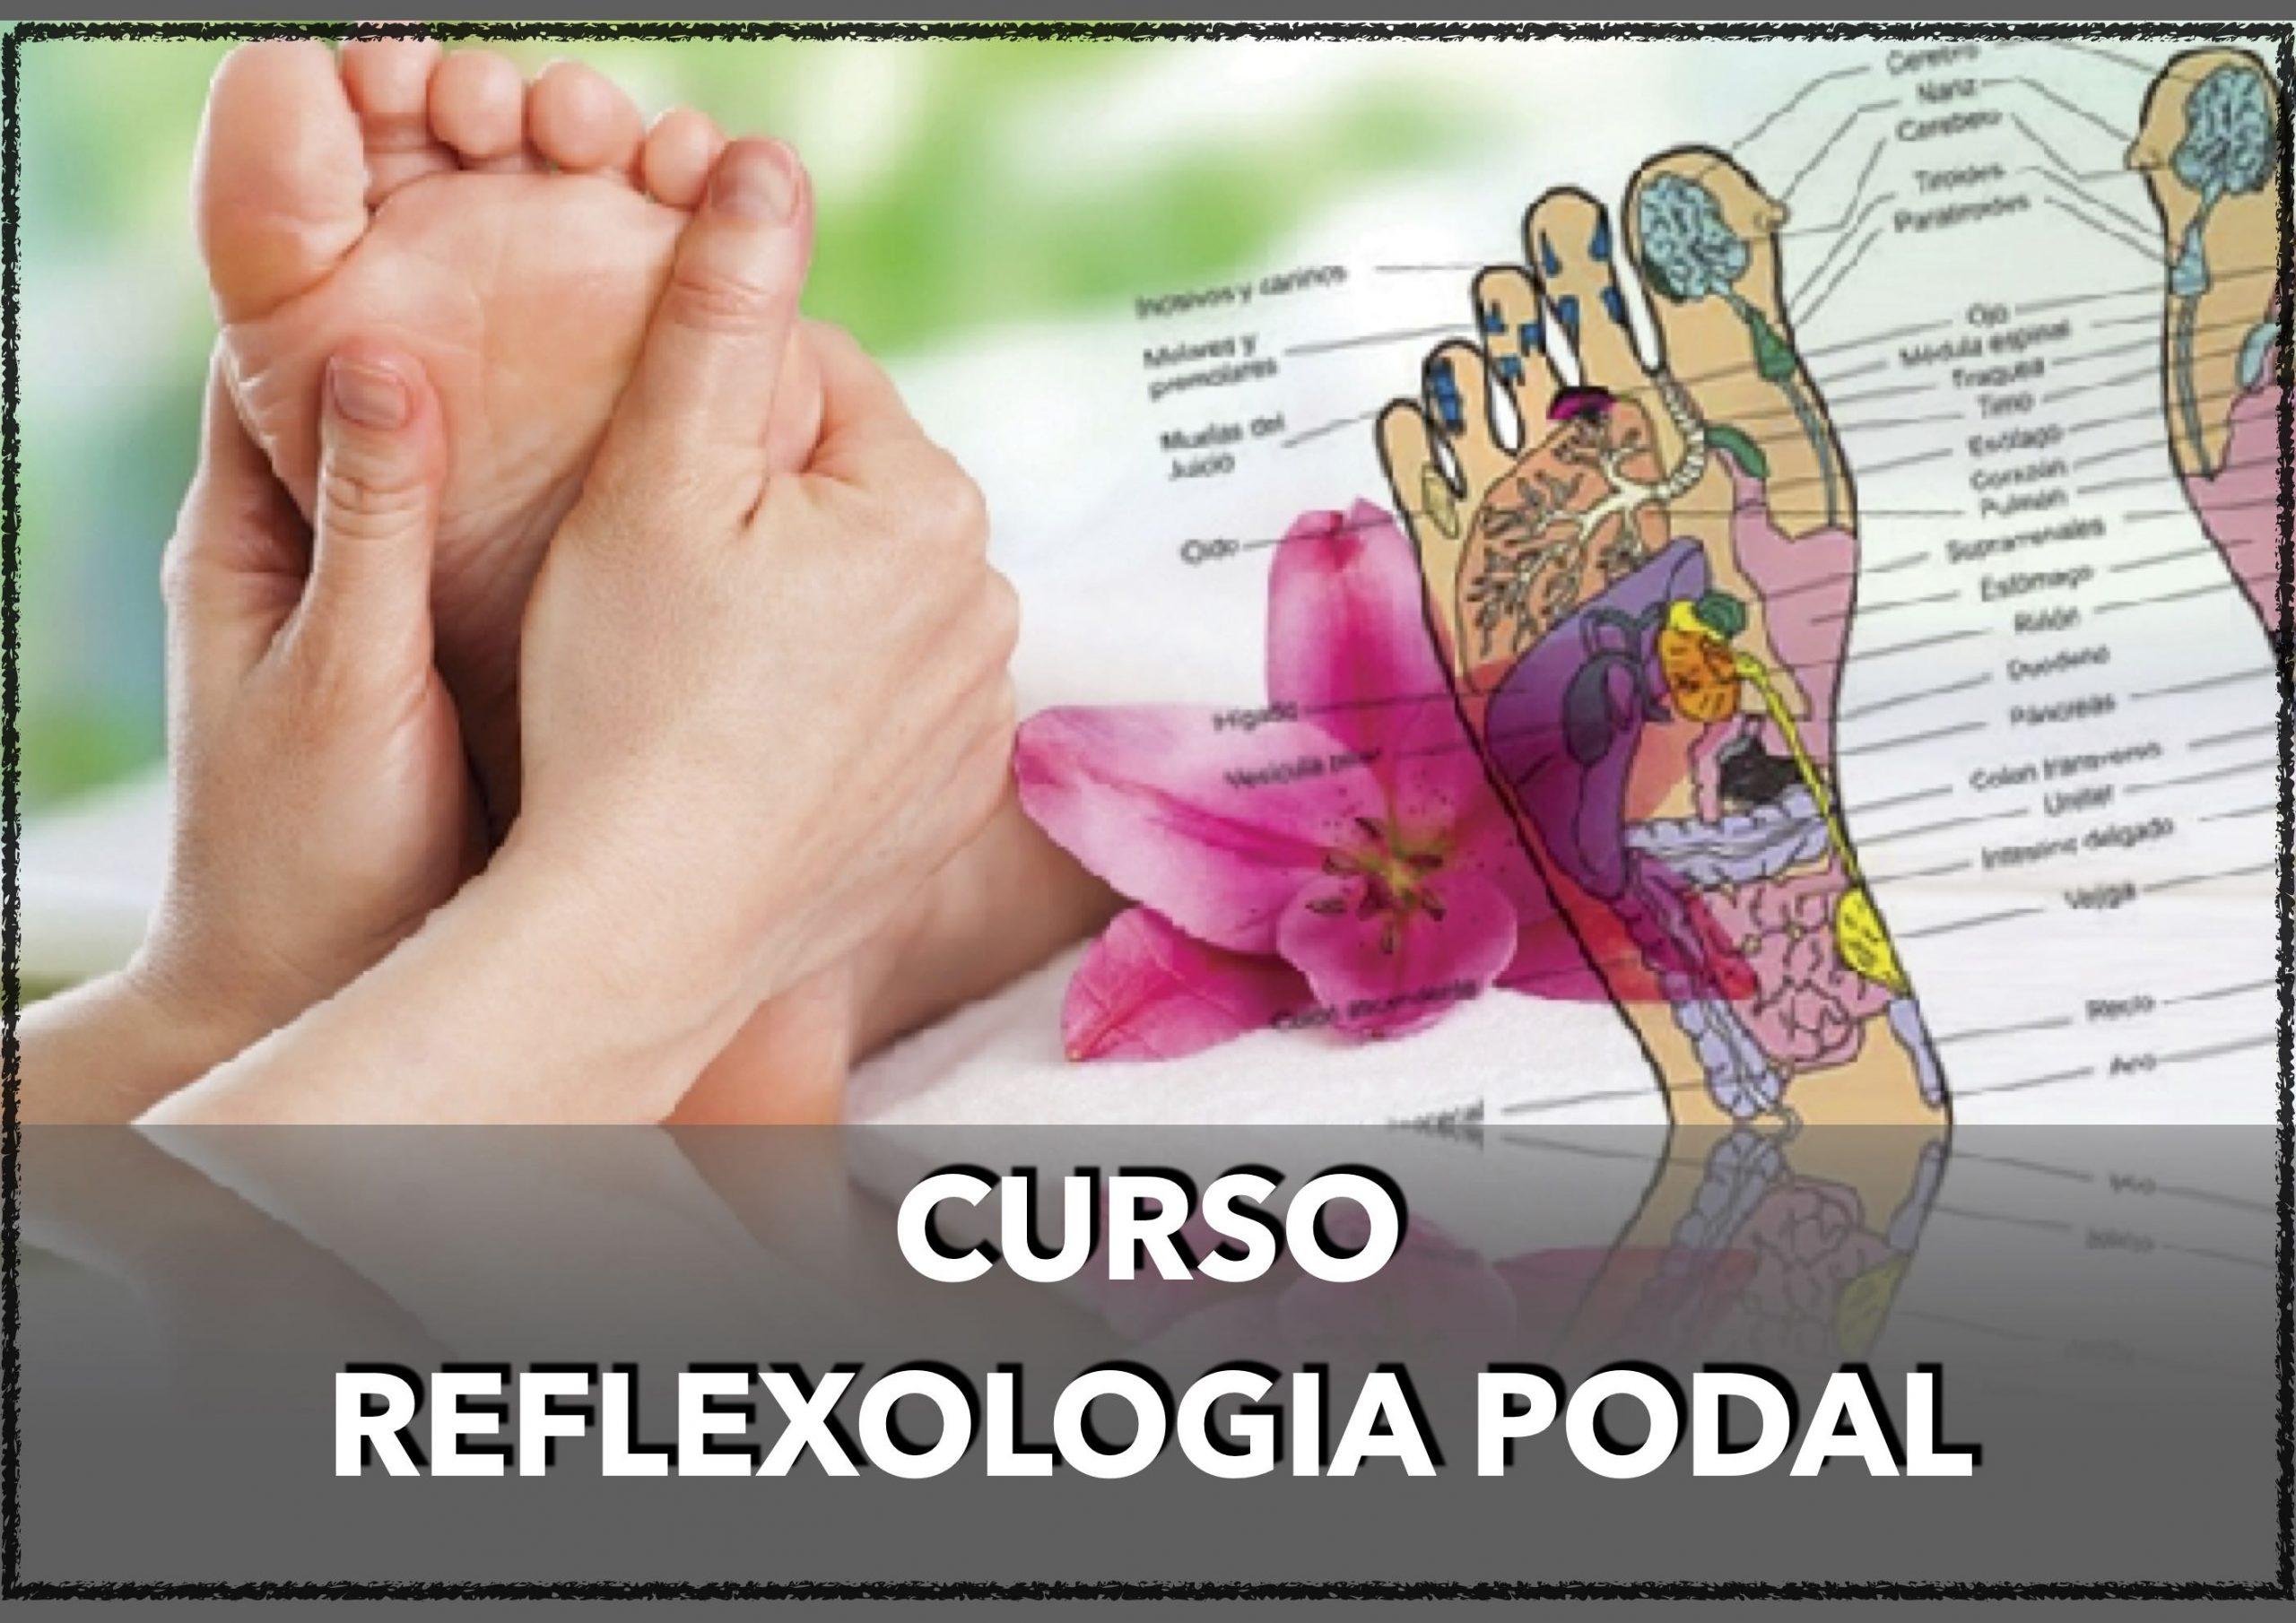 CURSO REFLEXOLOGIA PODAL CHICLANA CADIZ IBIZA HUELVA SEVILLA